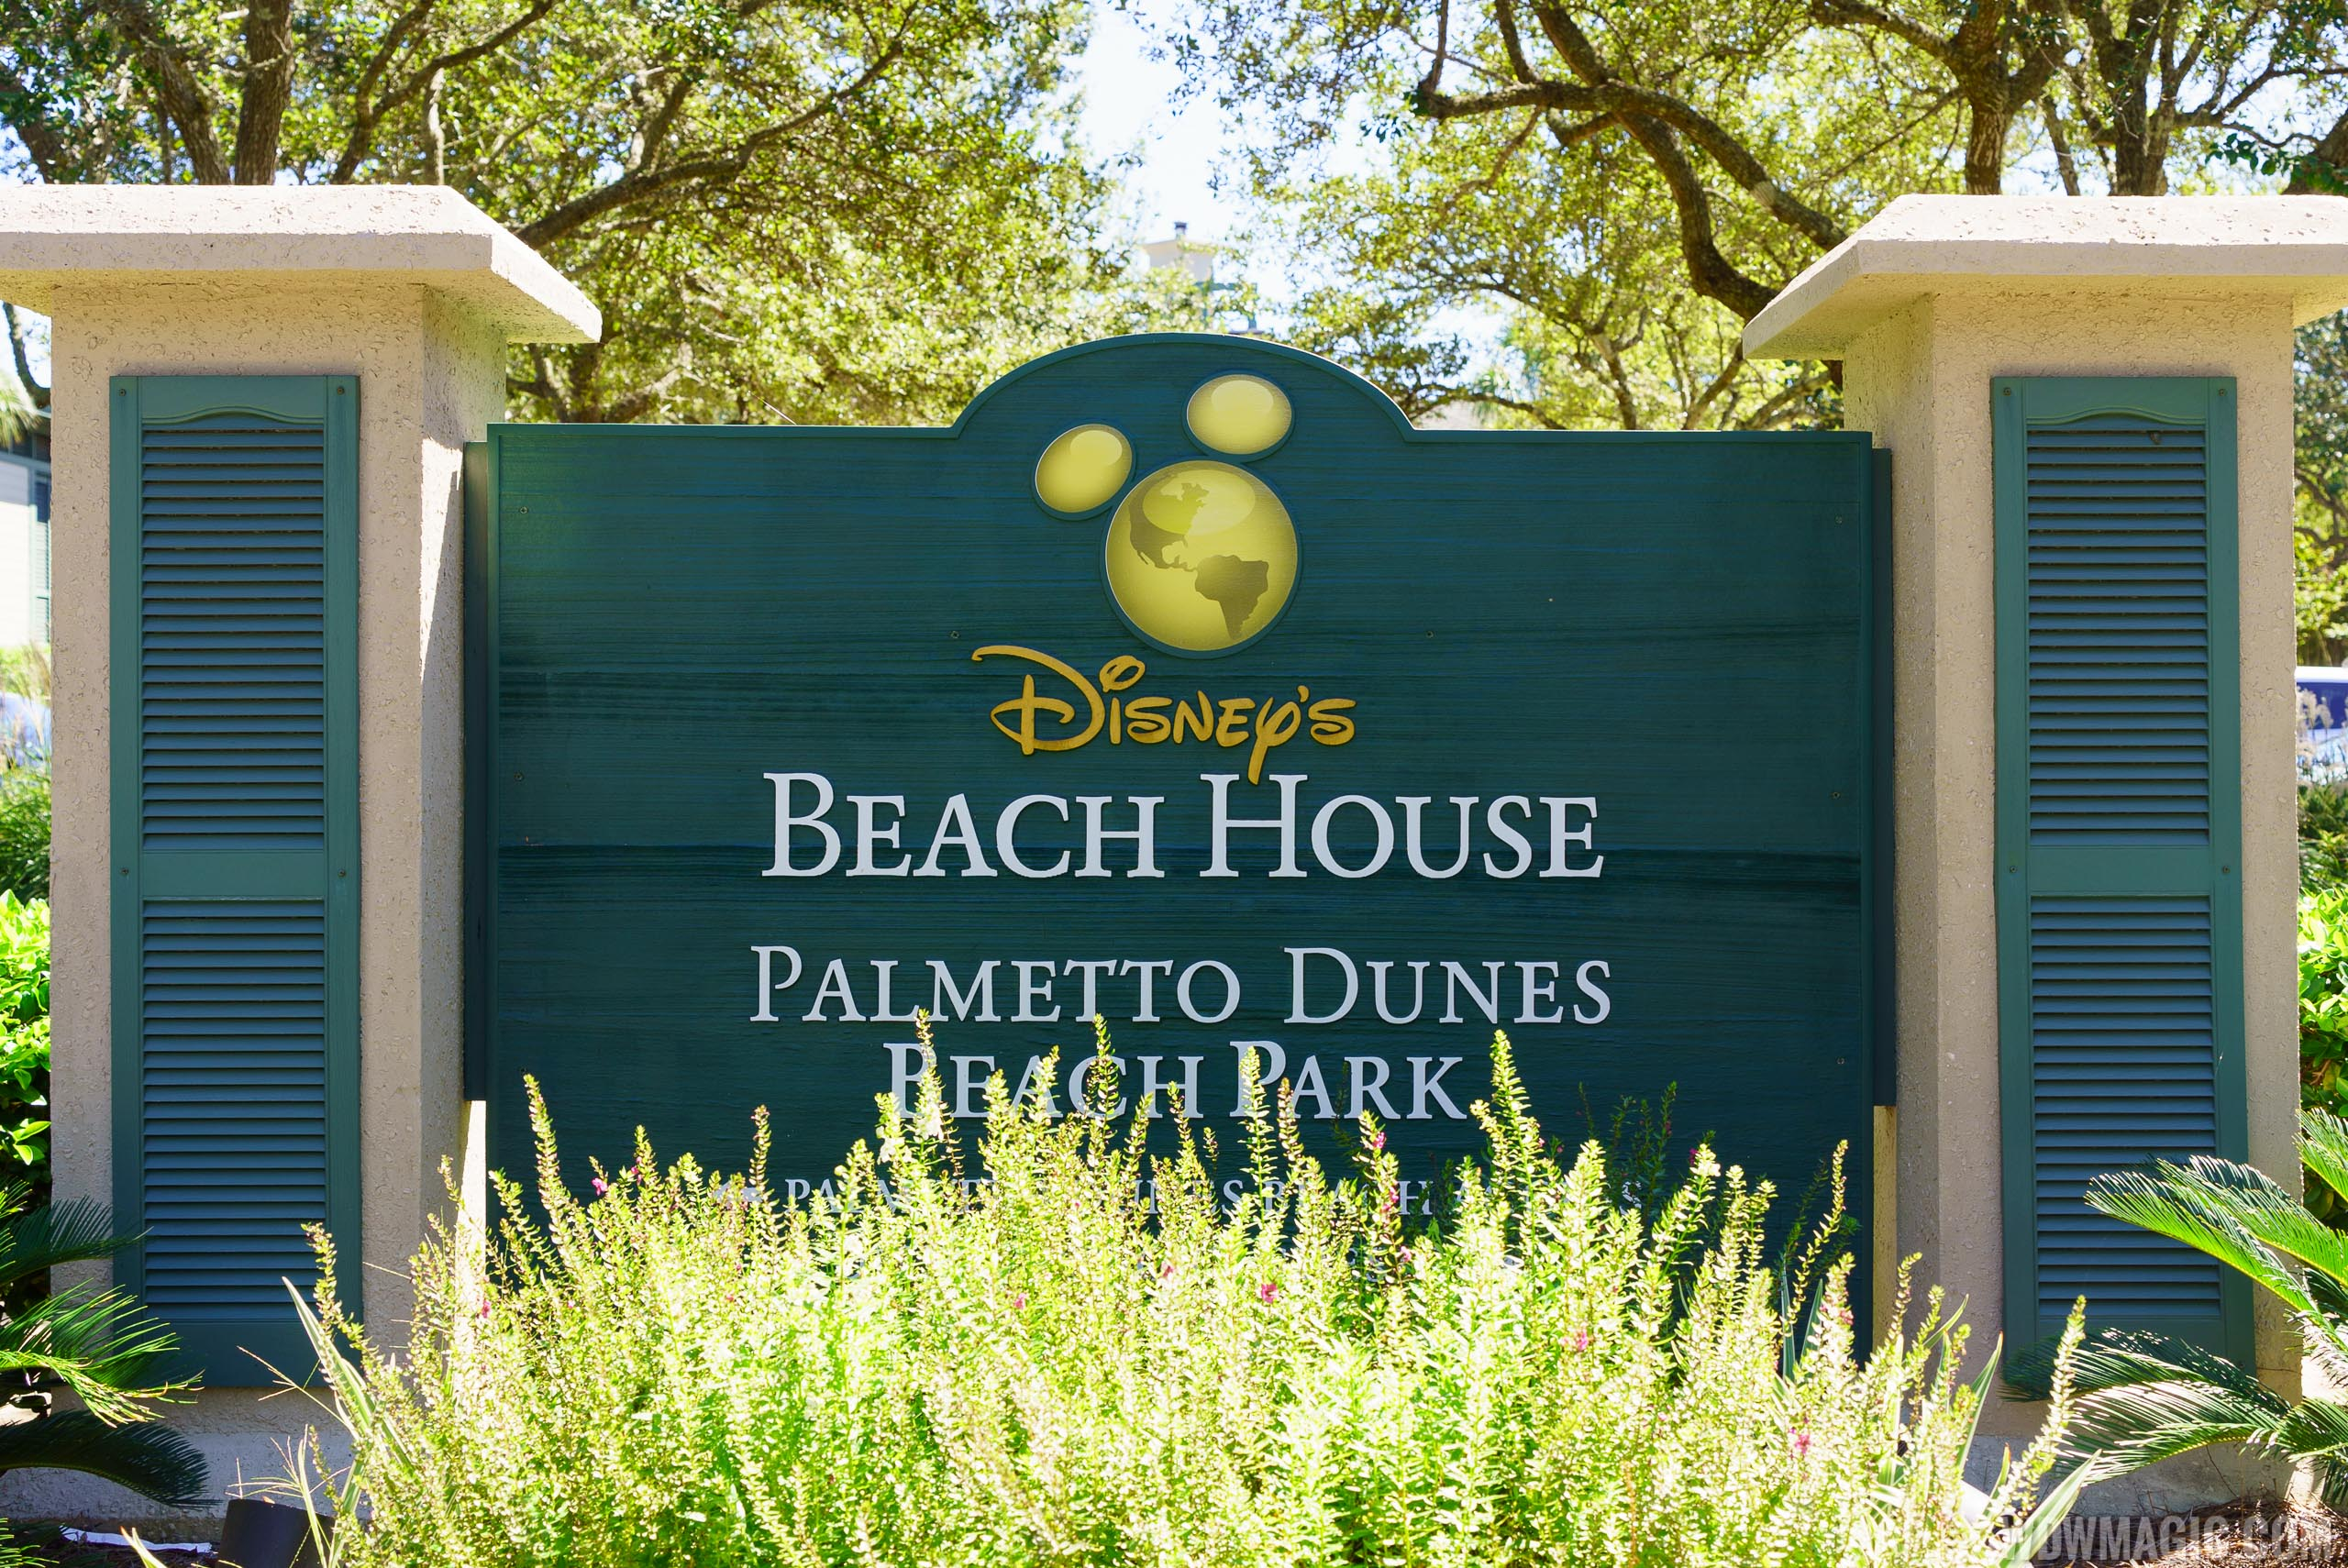 Disney's Hilton Head Island Resort - Beach House at Palmetto Dunes Beach Park